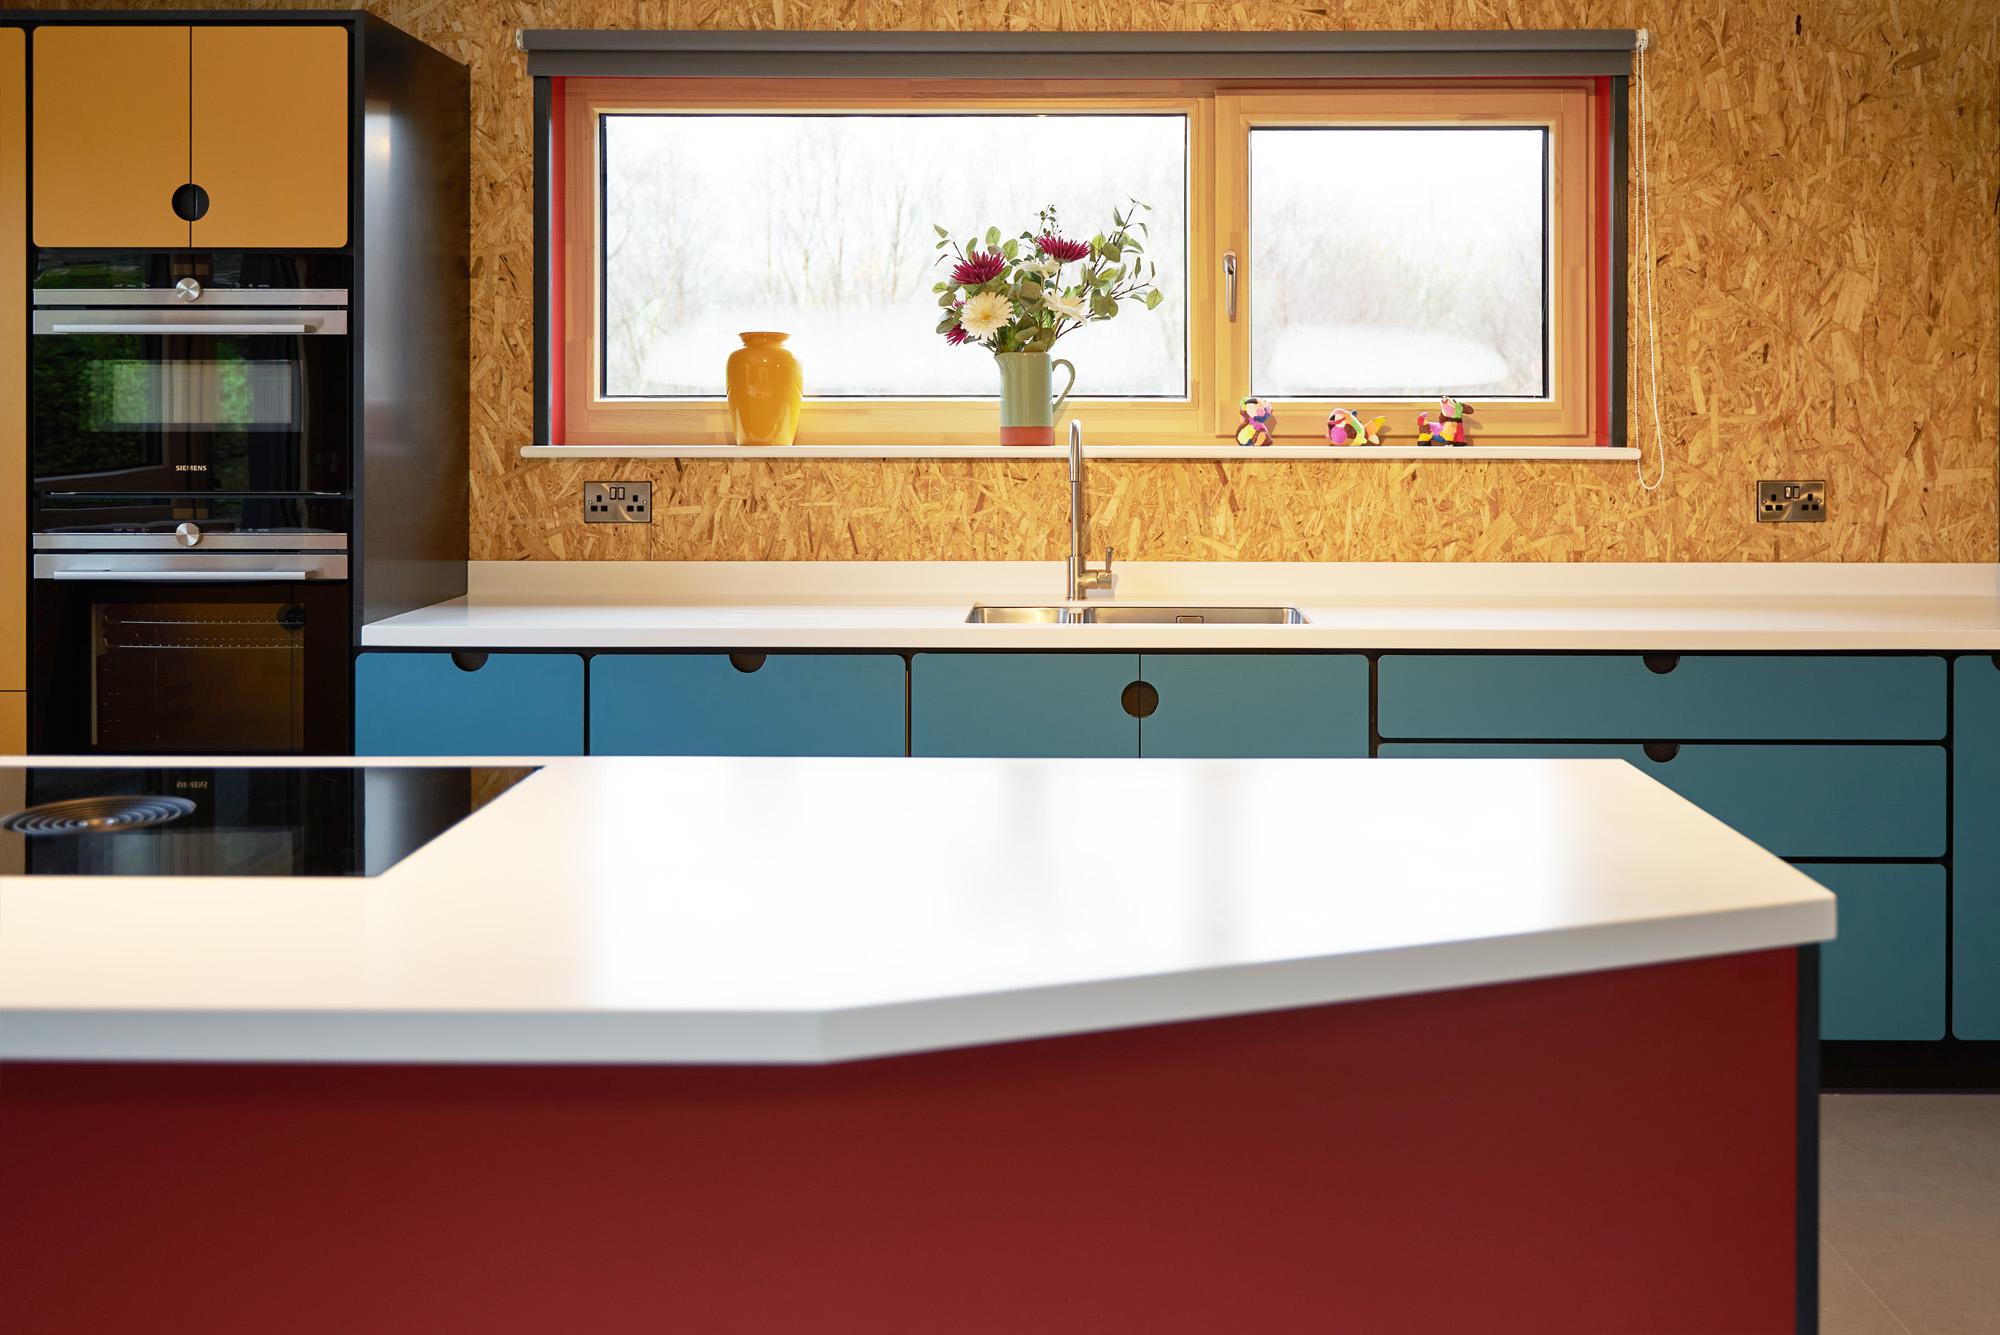 valchromat kitchen red